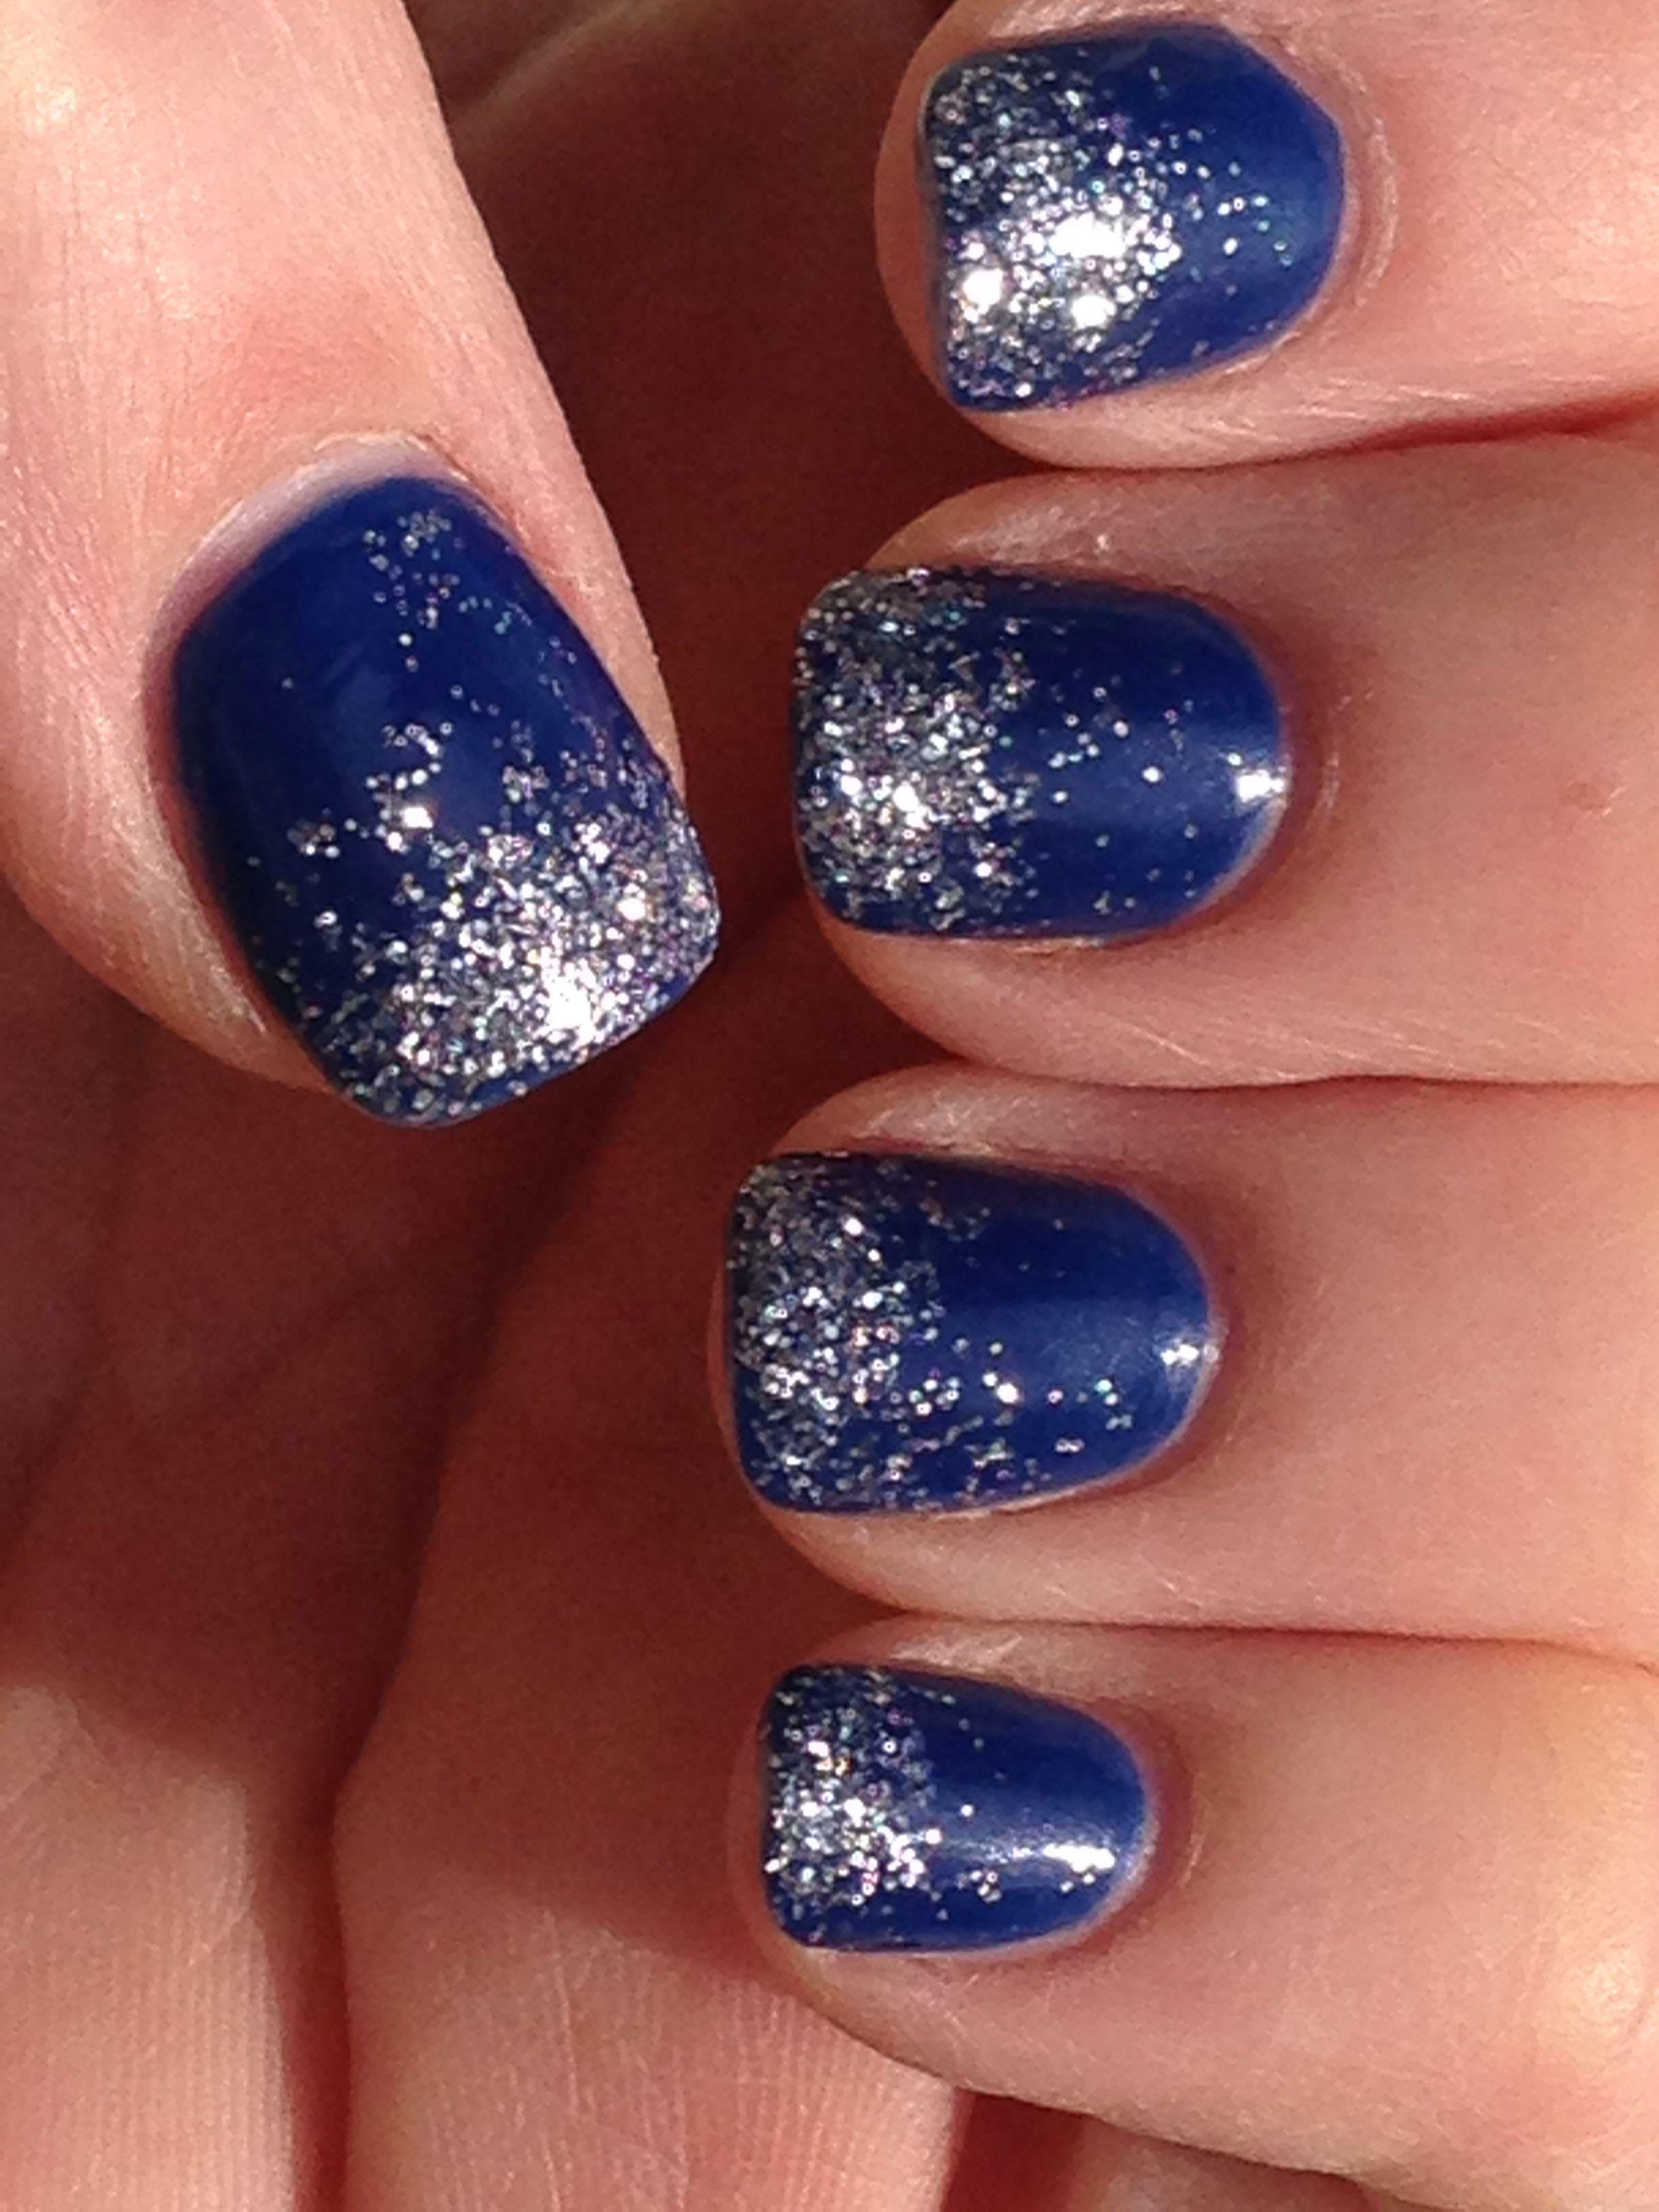 Pin by Hillary Rudloff on Nail srt | Pinterest